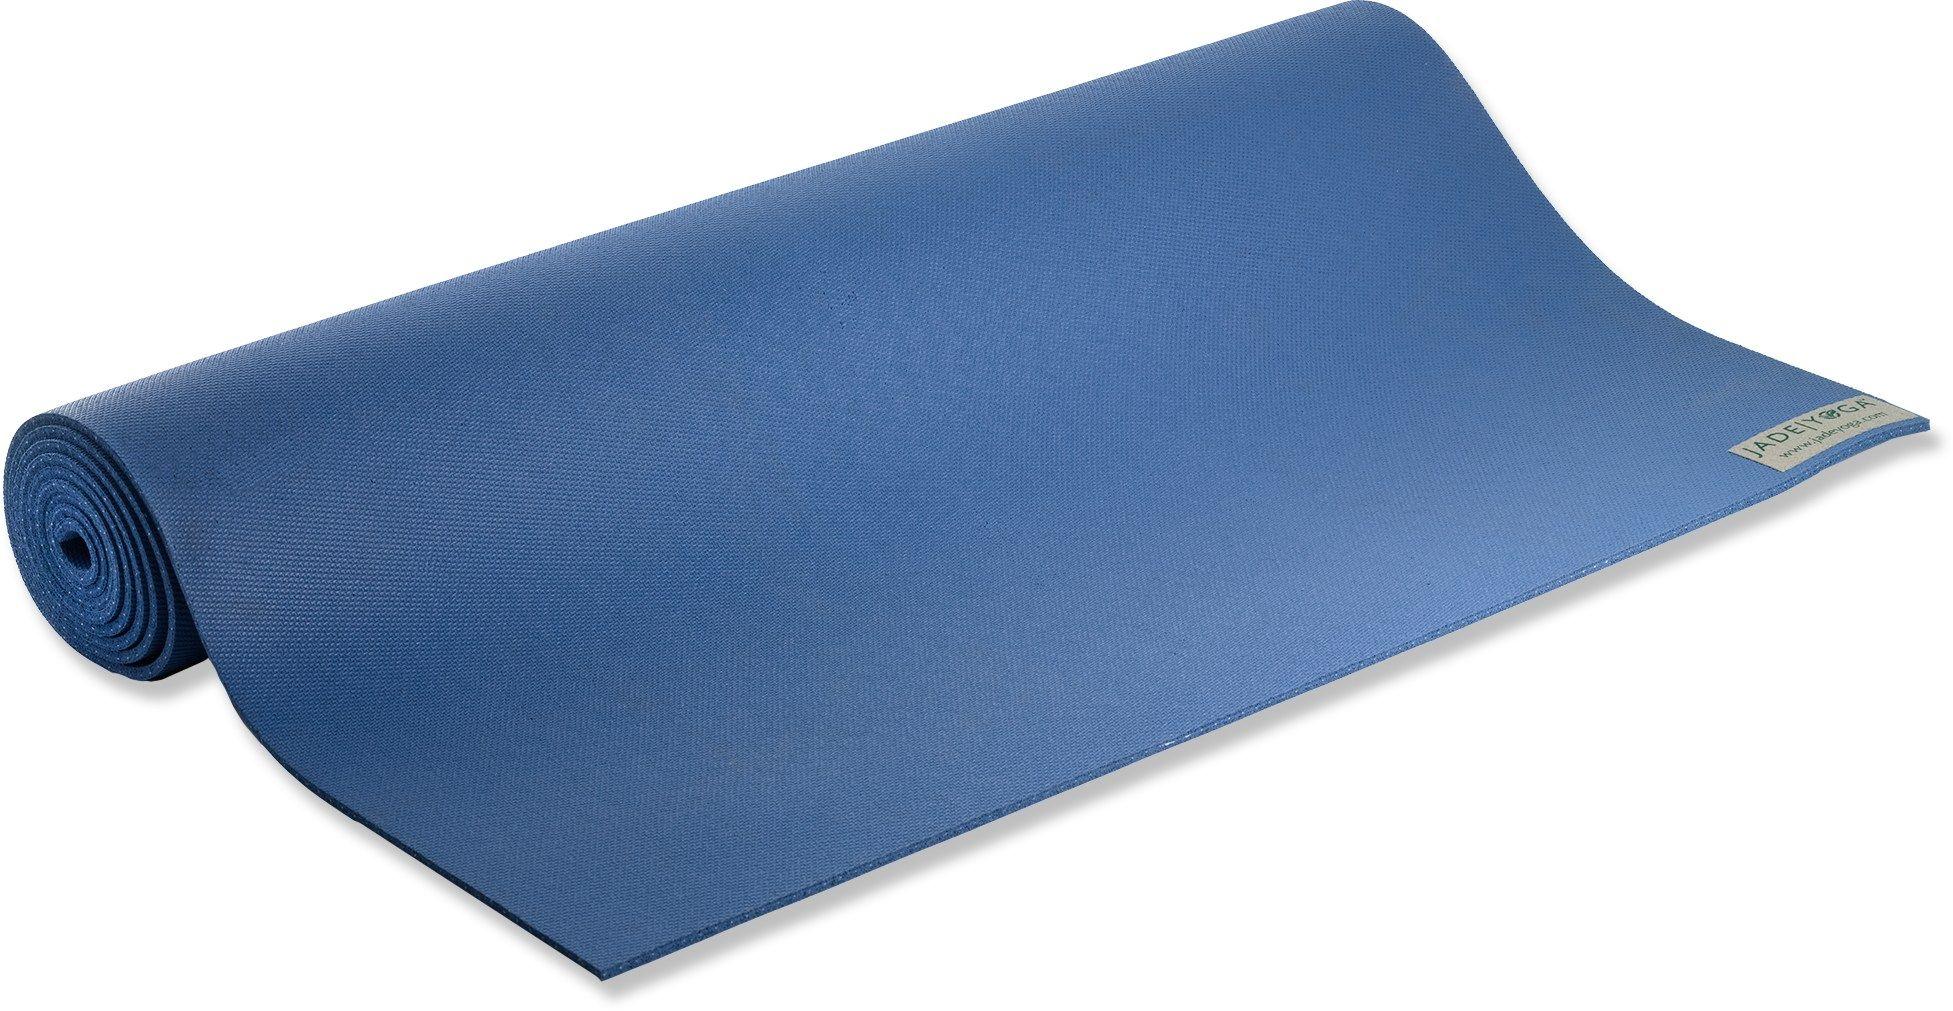 Jade Harmony Professional Yoga Mat | Yoga accessories ...